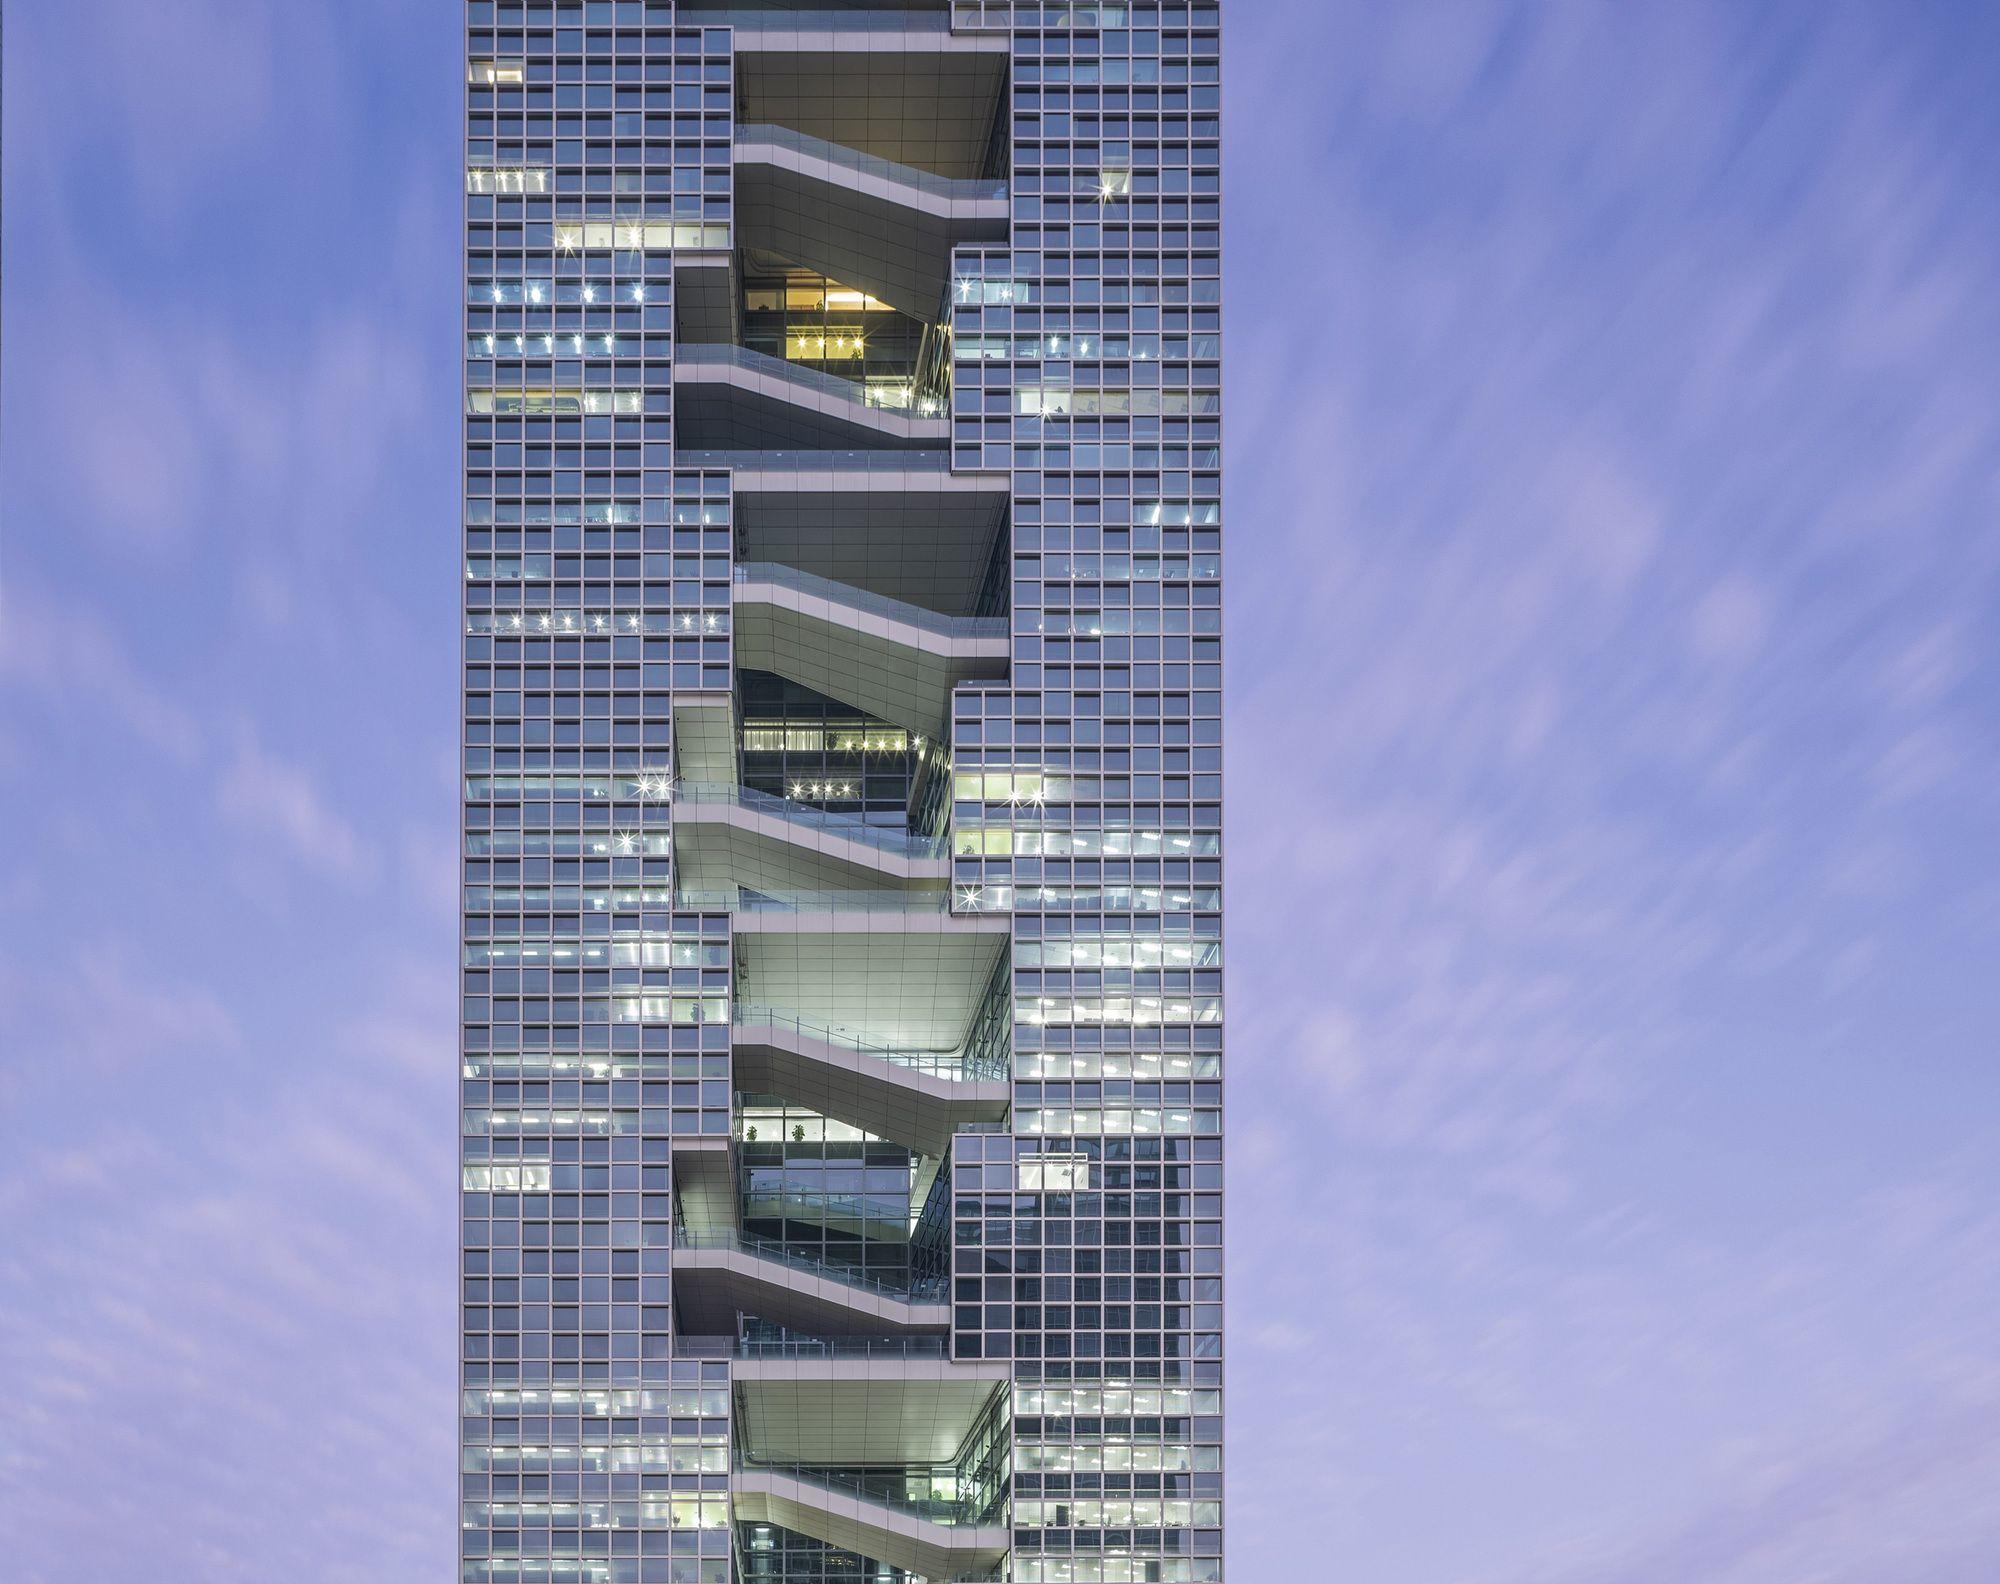 Baidu Headquarters Dongxiying Studio Ccdi Architecture Skyscraper Amazing Architecture